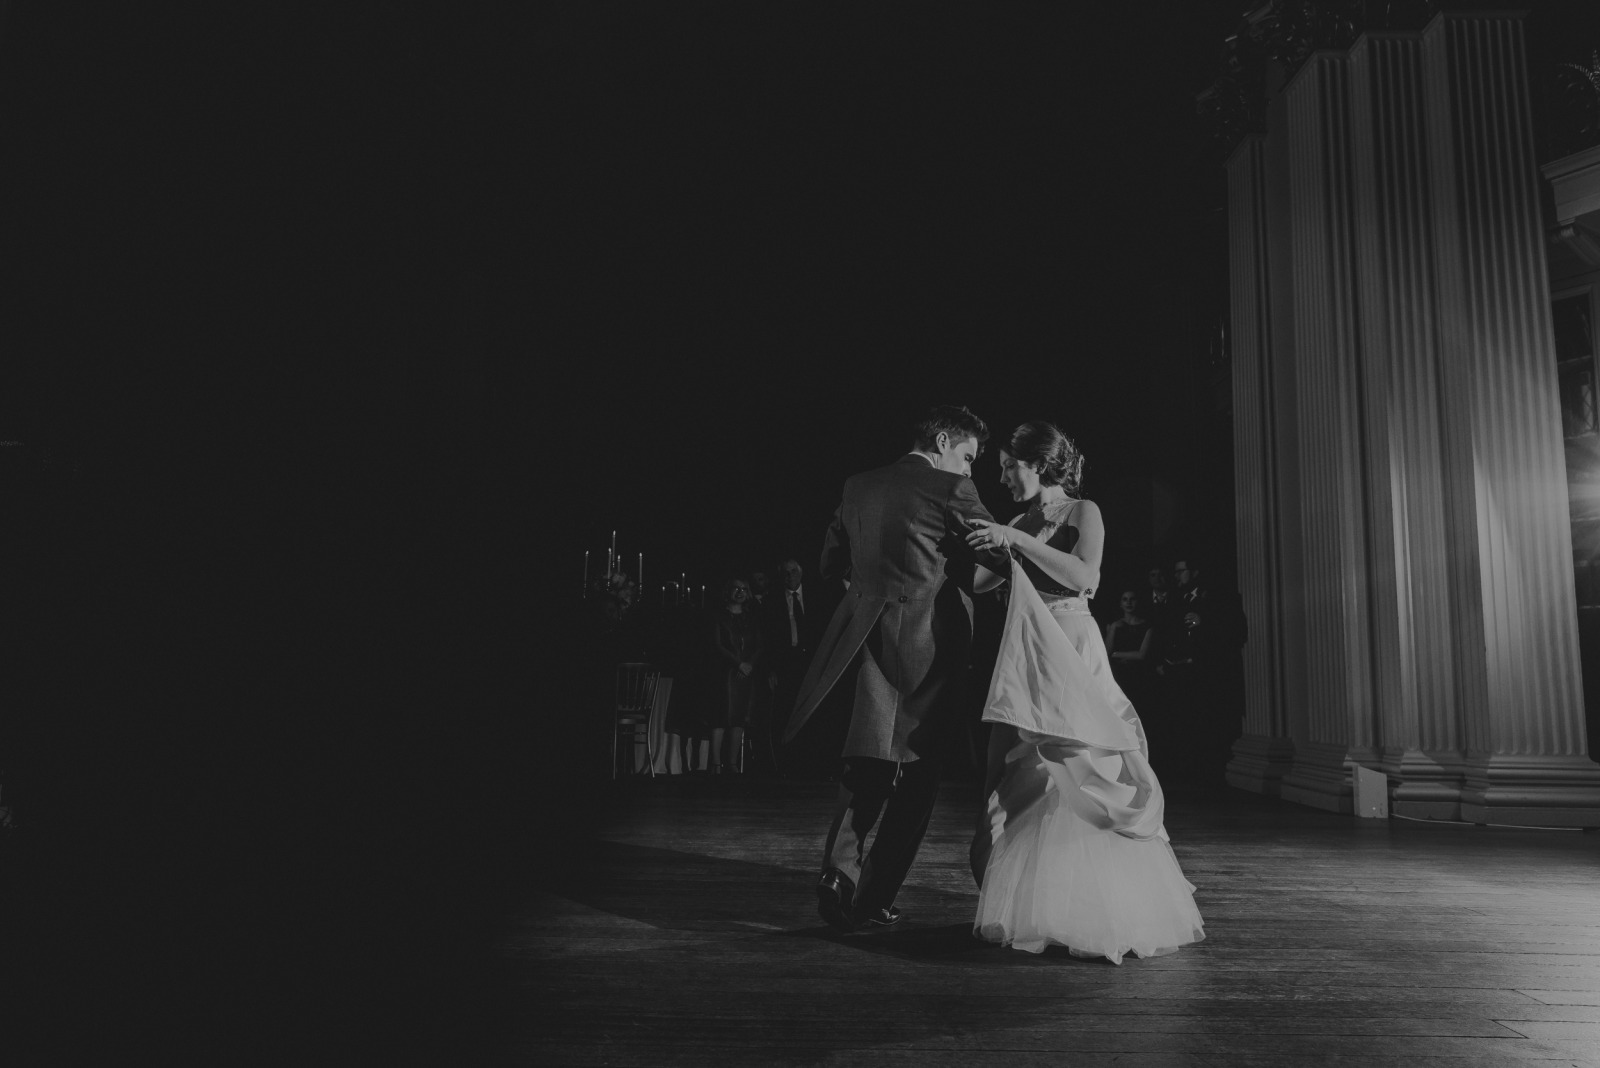 signet-library-wedding-edinburgh-77